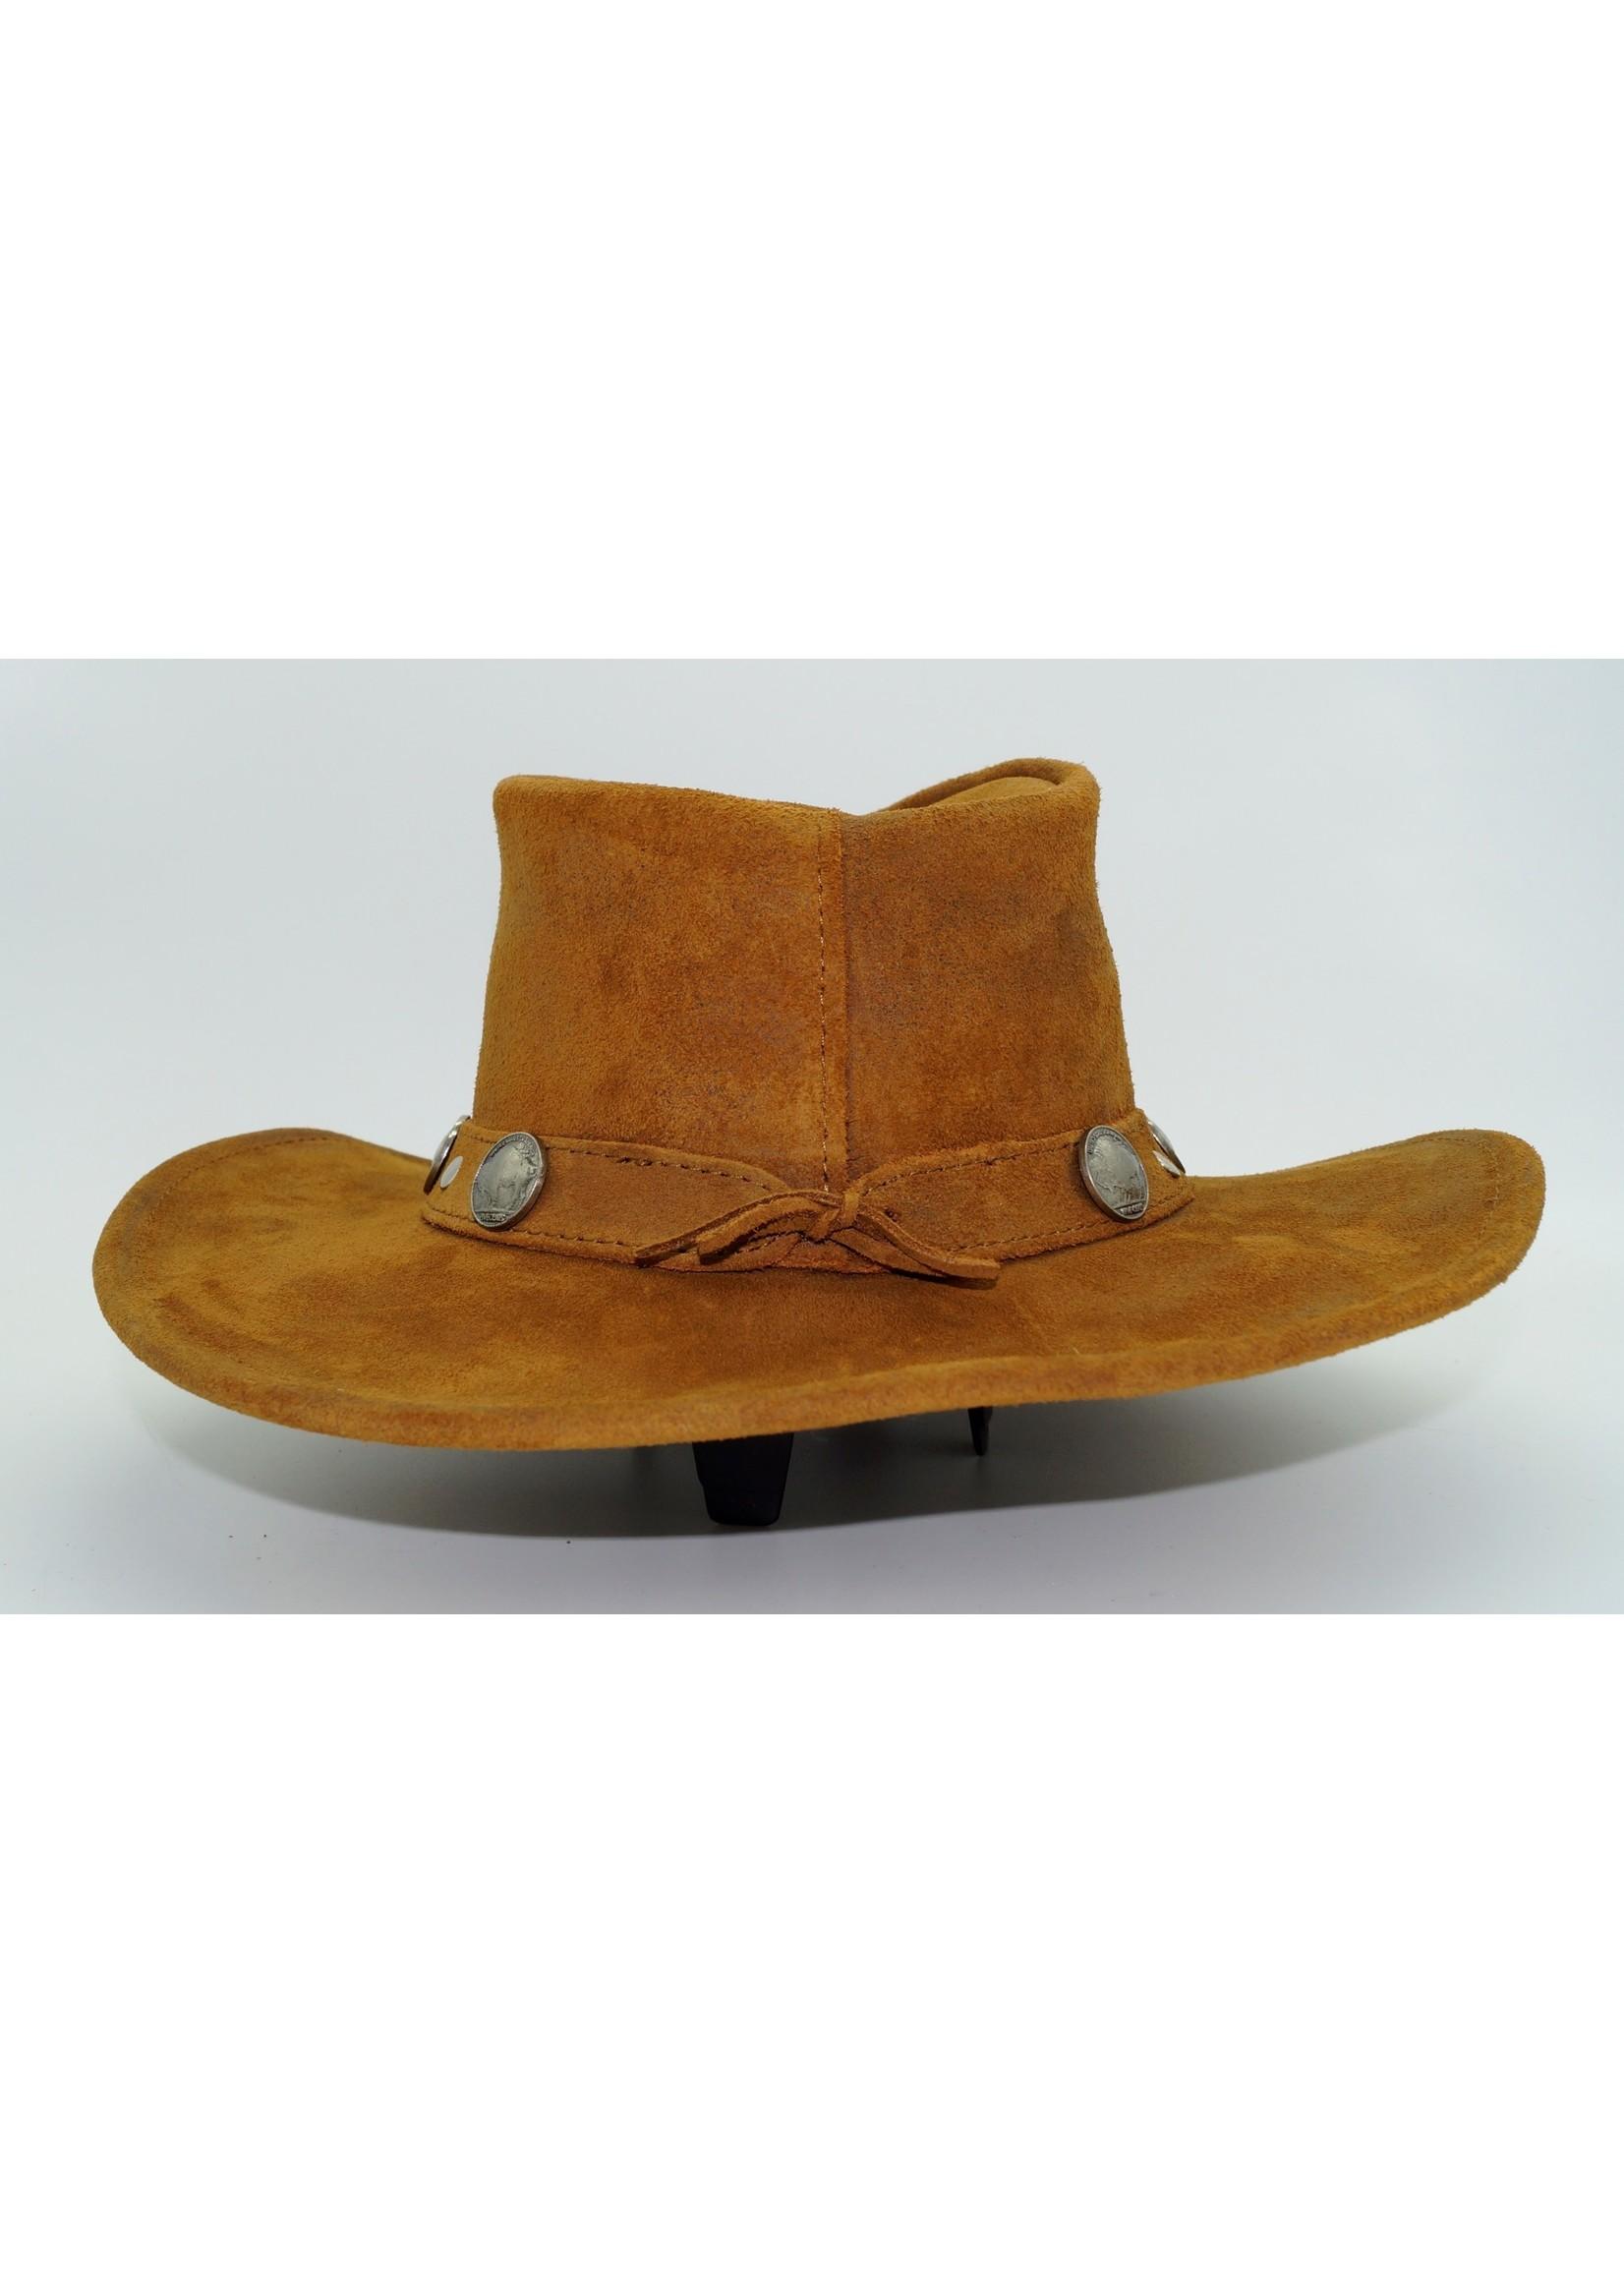 Minnetonka Buffalo Nickel Hat Tan 9513